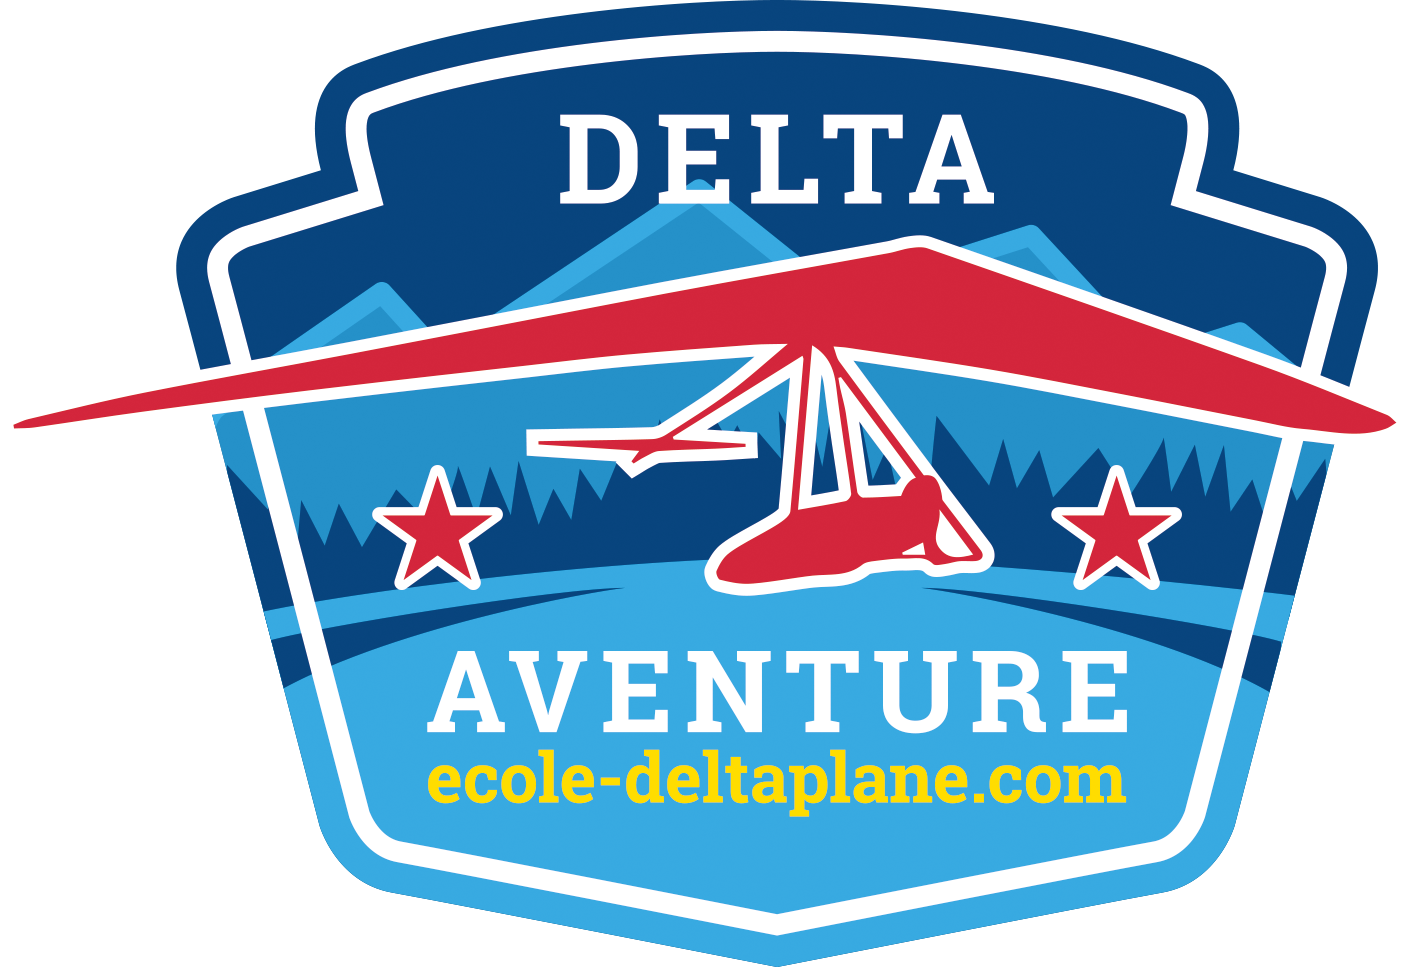 ecole-deltaplane